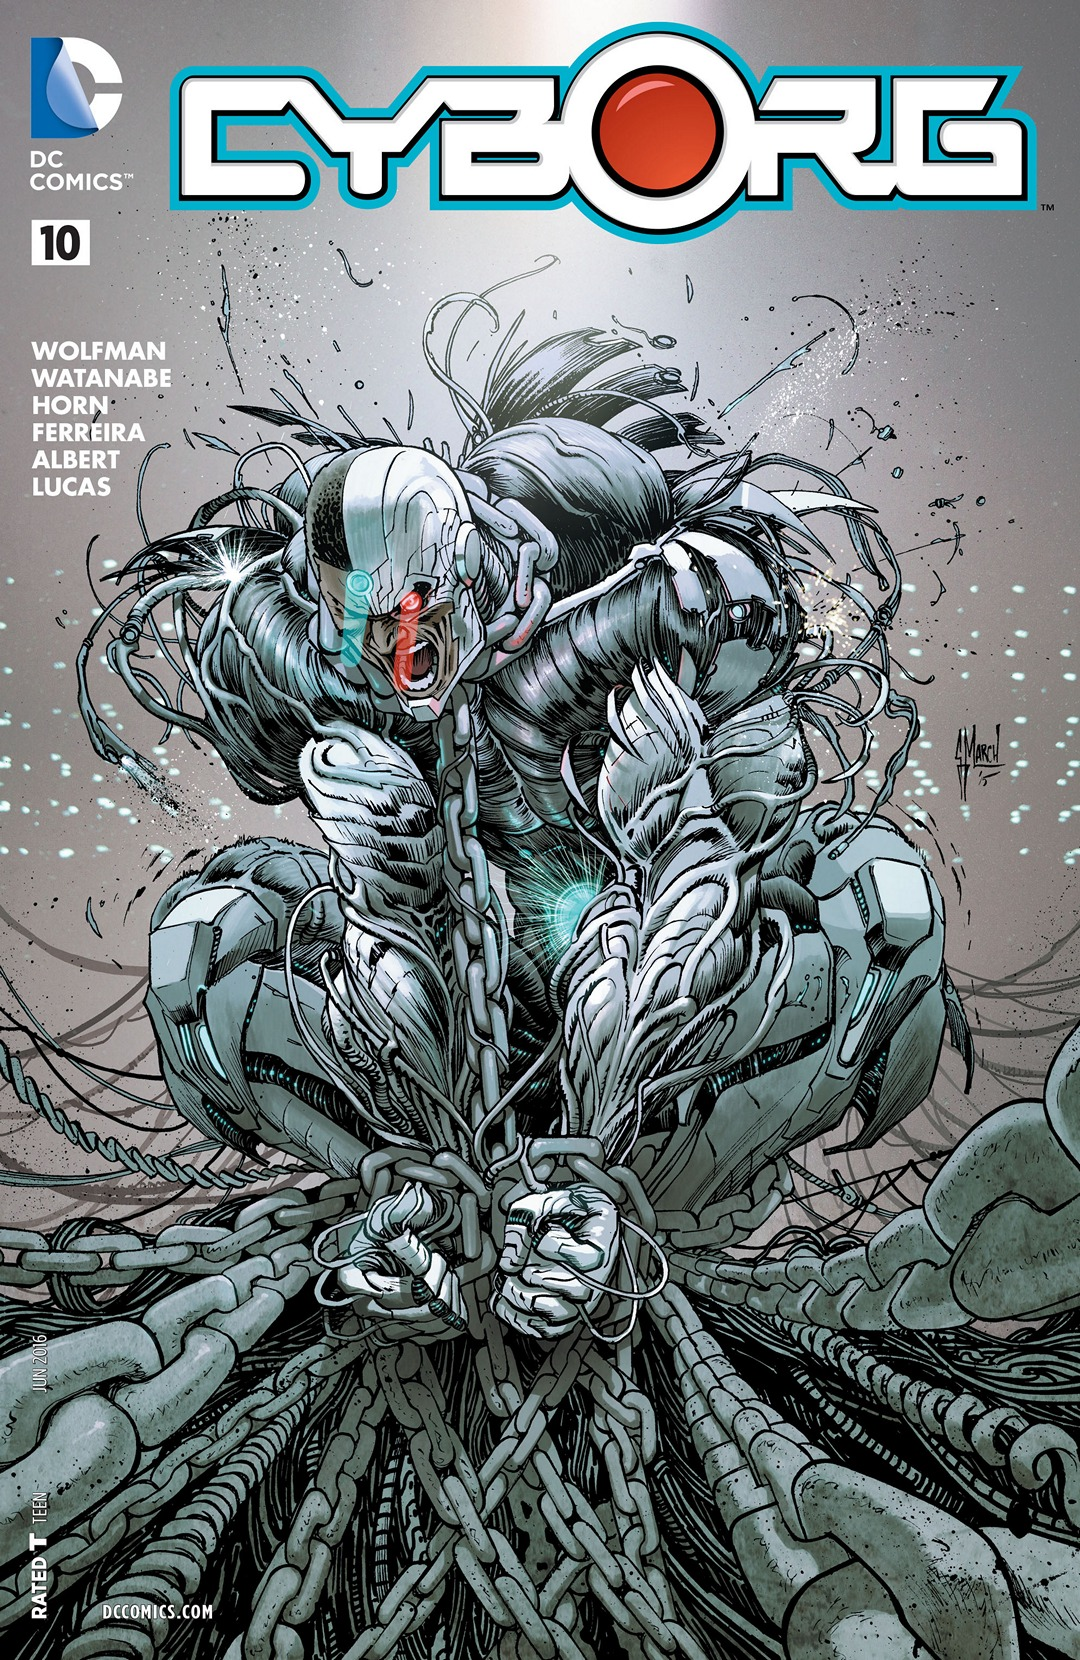 Cyborg Vol 1 10